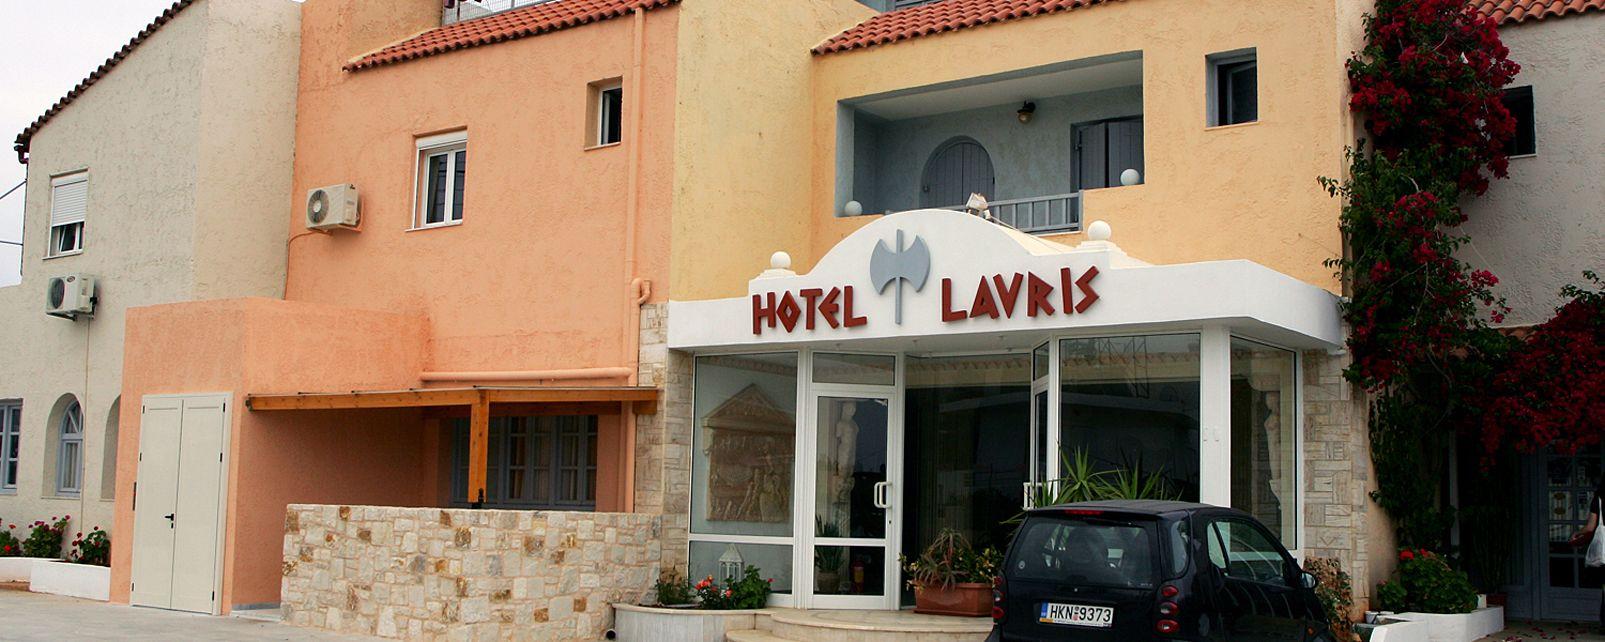 Hotel Lavris